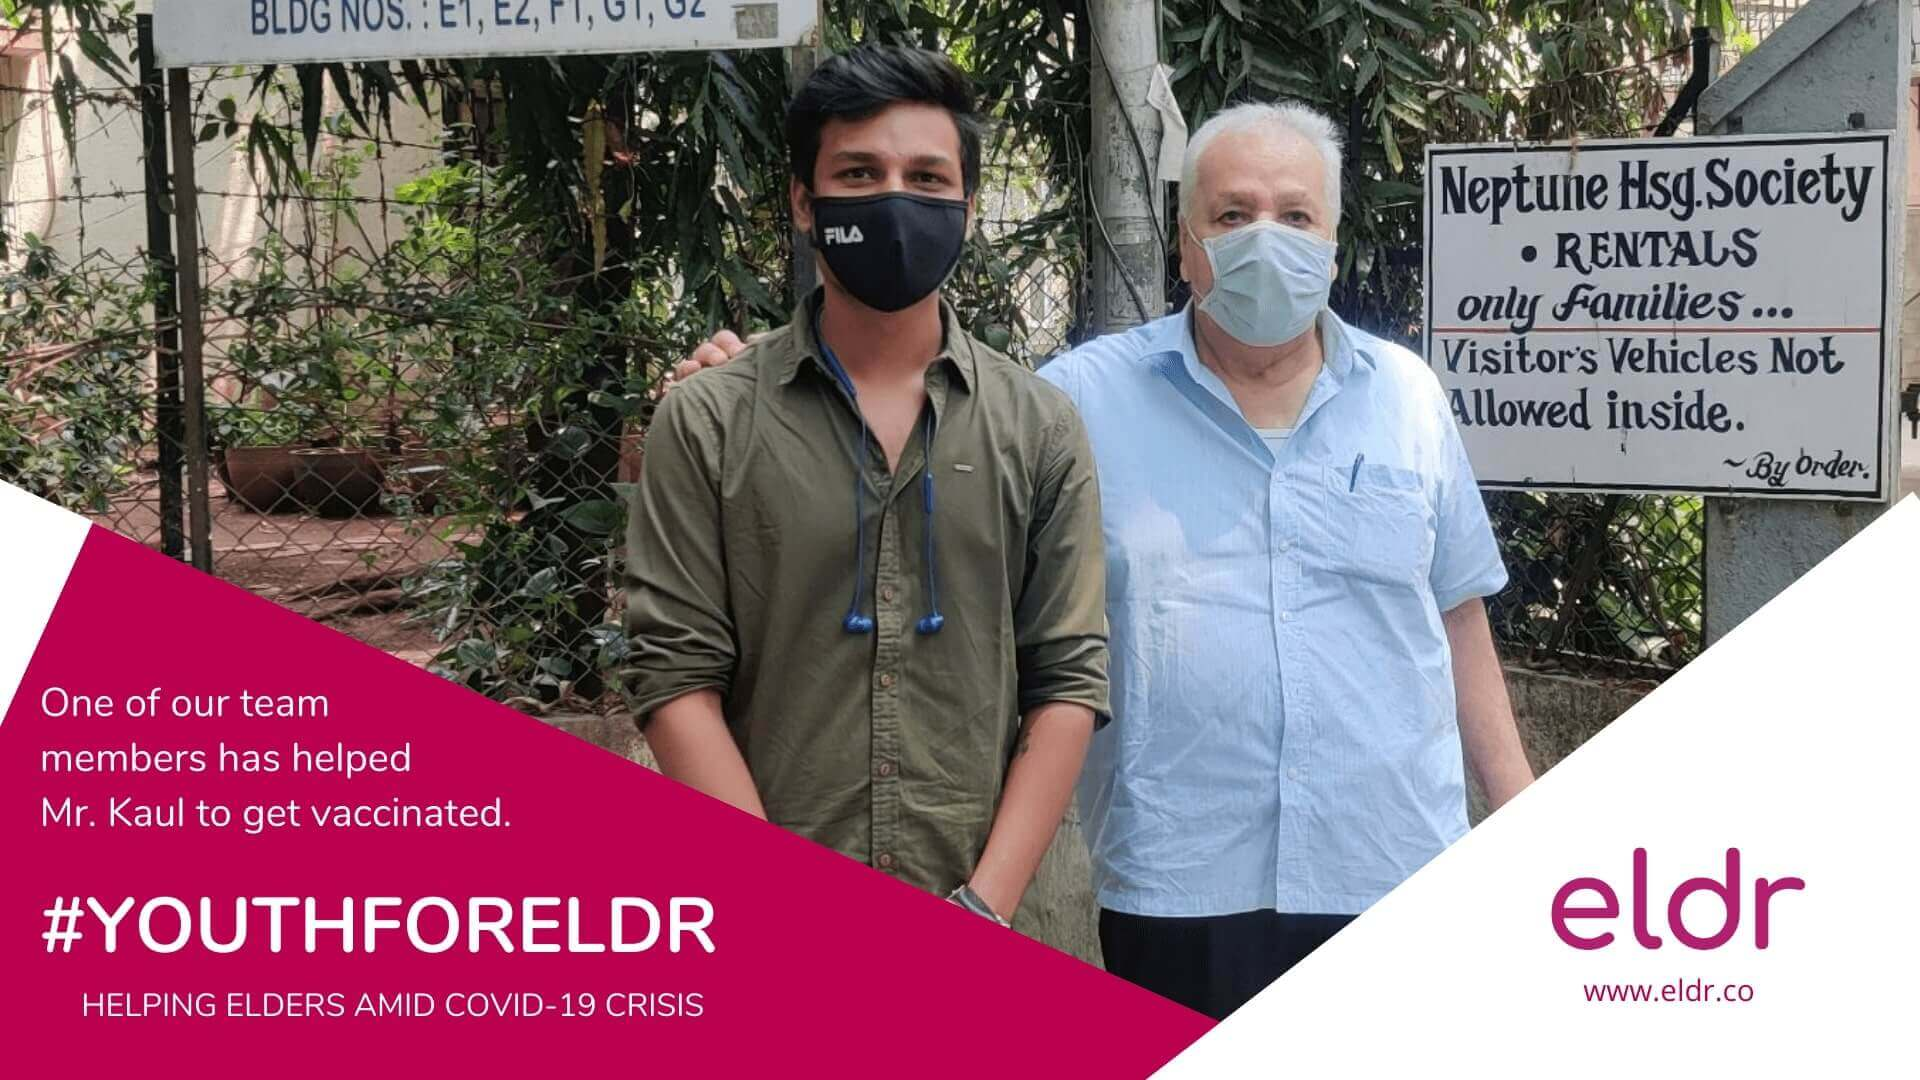 team-member-help-vaccination-eldr (1)